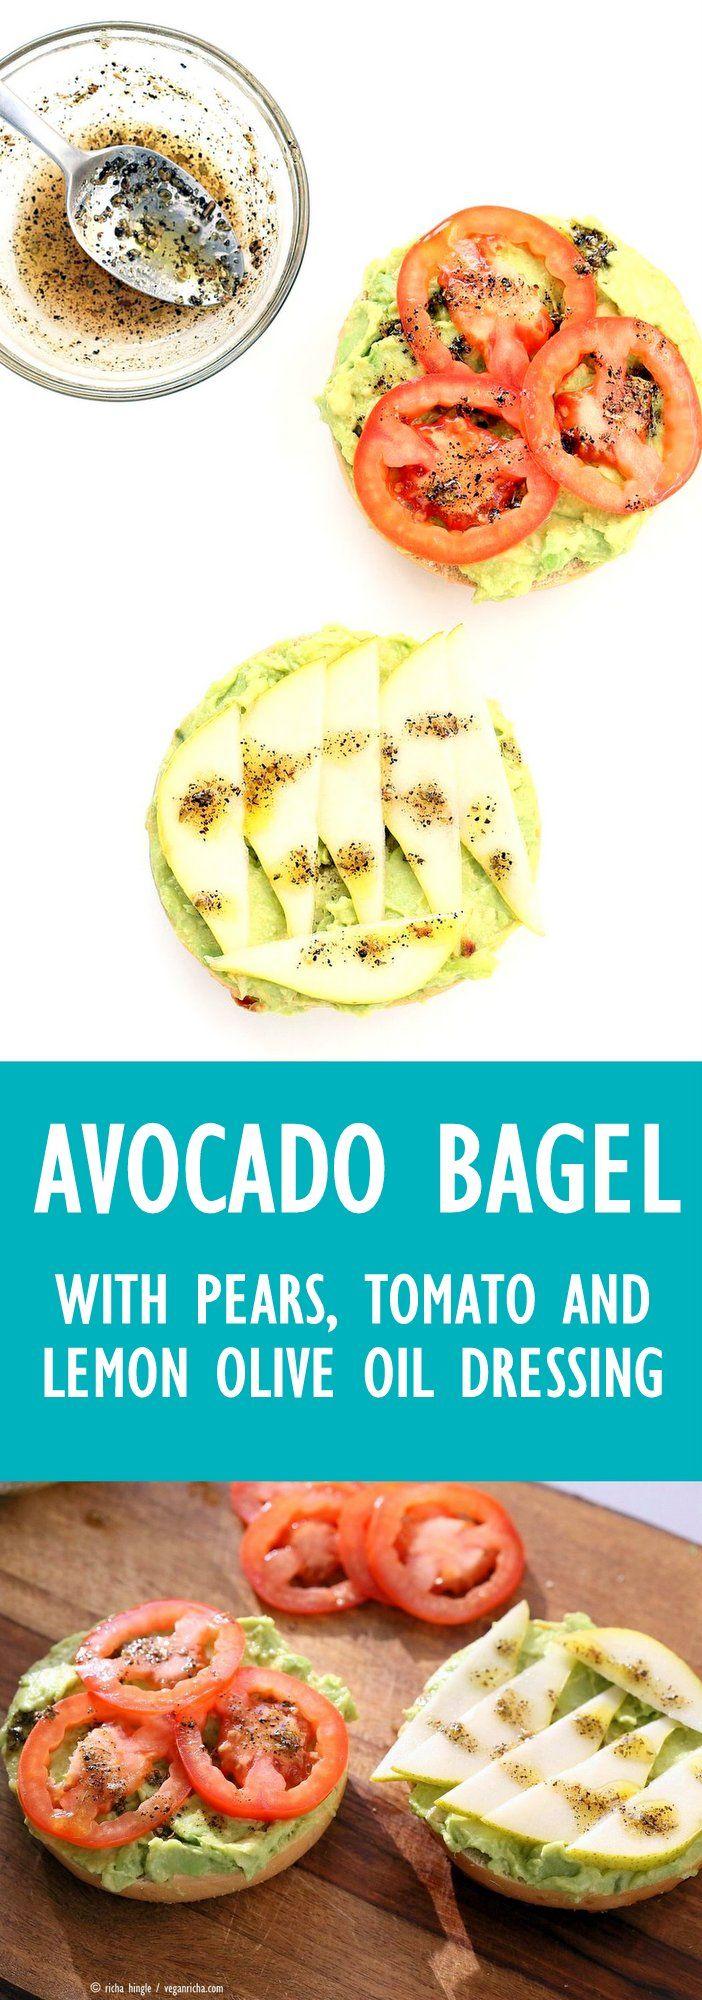 Avocado Bagels with Pears and Tomatoes and Mediterranean Oregano Garlic Olive Oil Dressing Bagel Avocado Toast. Easy Vegan Snack or Breakfast.   VeganRicha.com